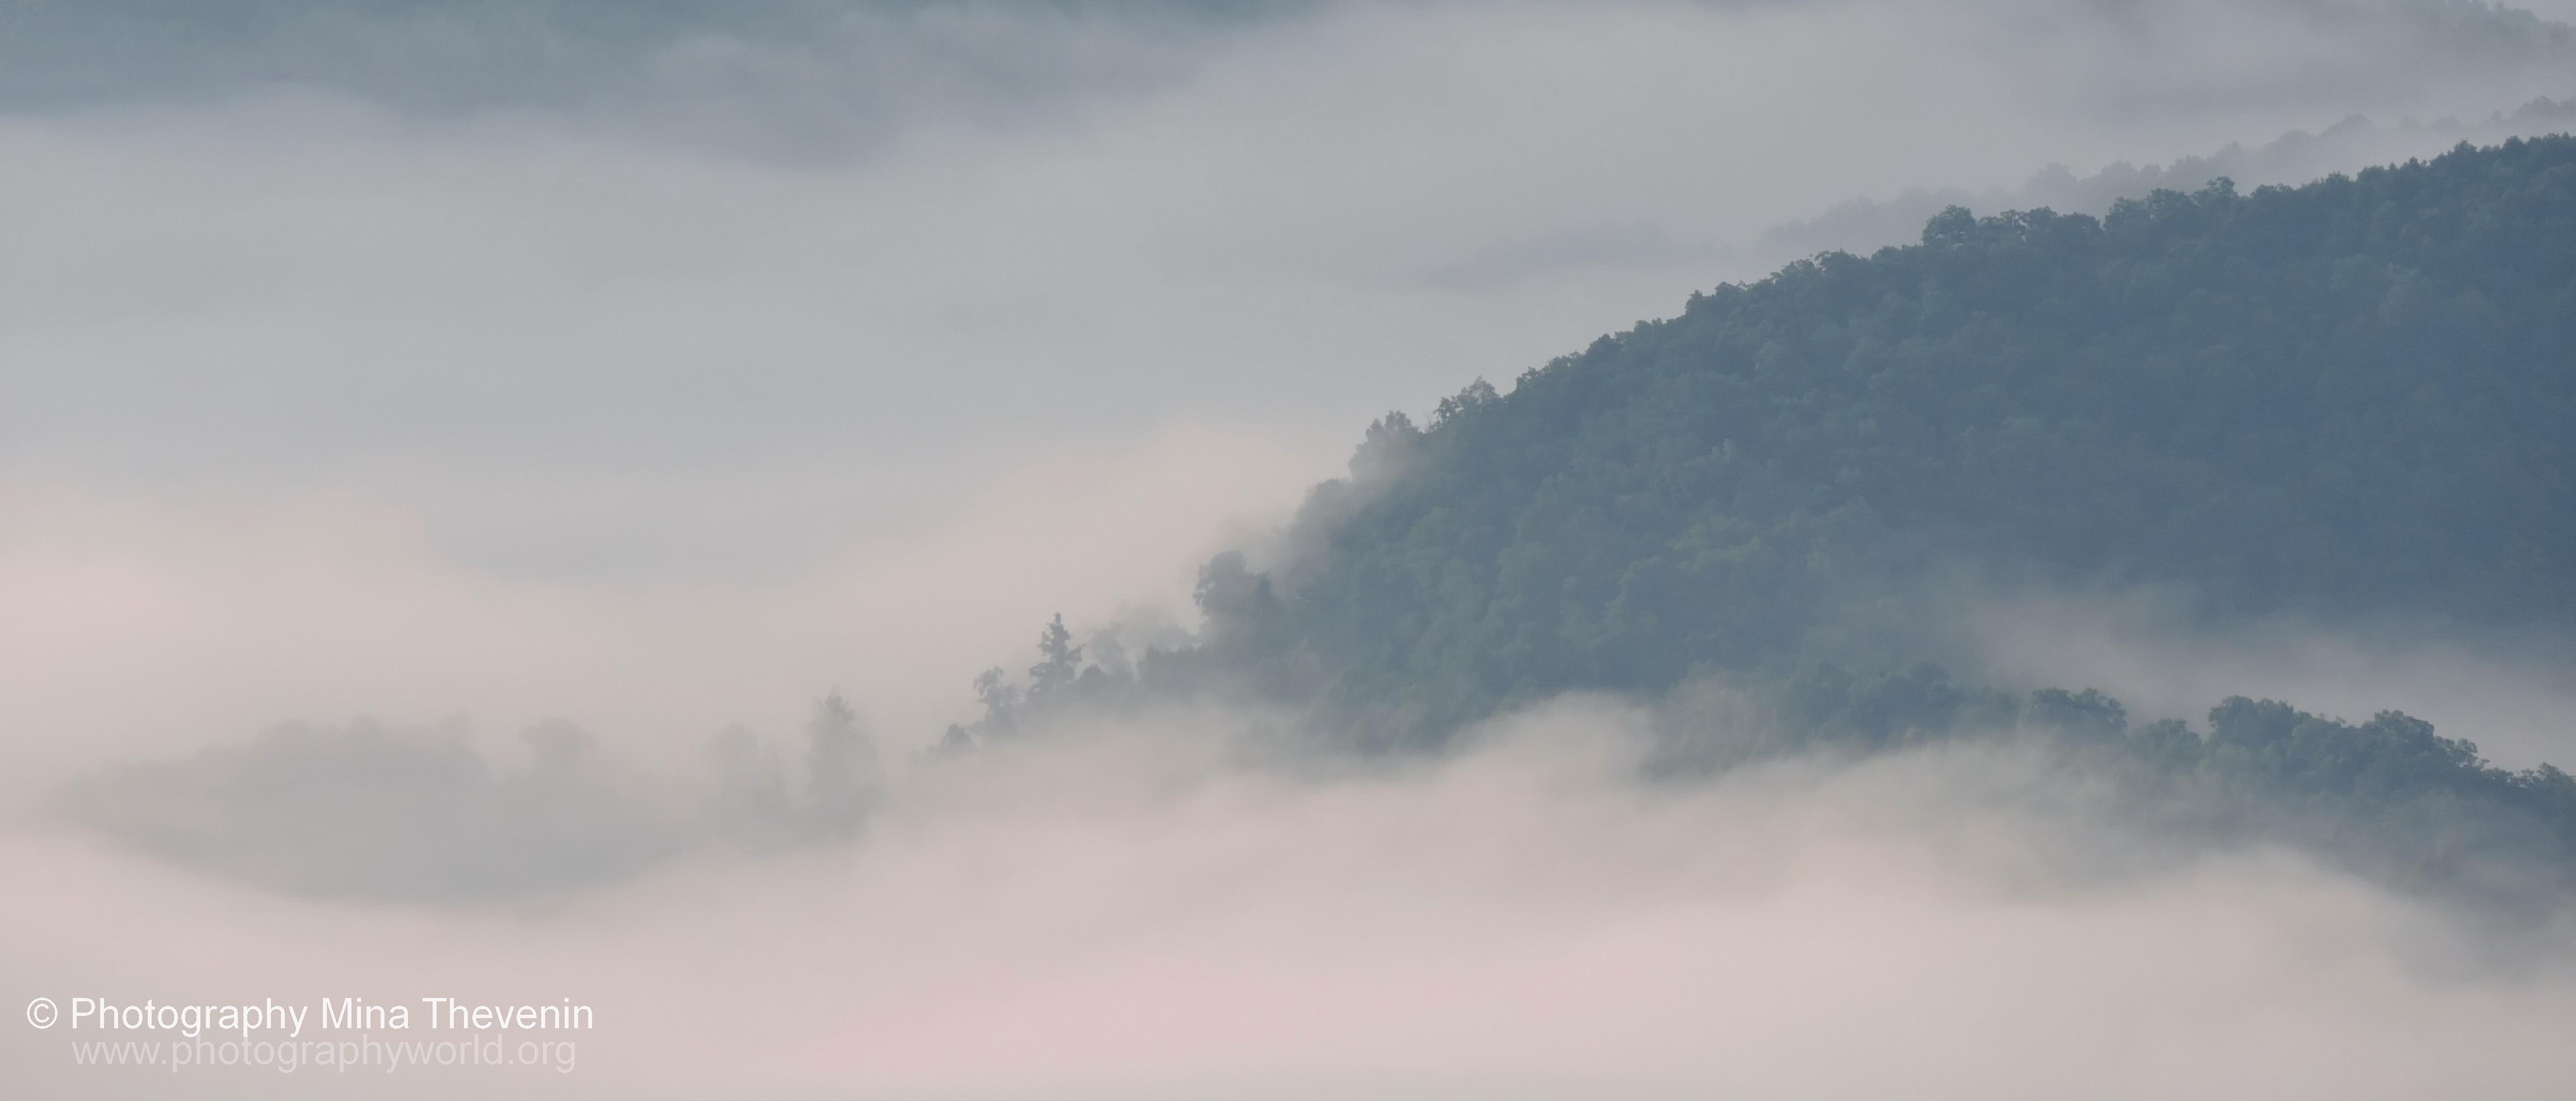 "© Fog over NC Appalachia. Photograph by Mina Thevenin. Photography World article: ""APPALACHIAN TRAIL|Take a Walk on the Wild Side|Nantahala|Tellico Gap to Wayah Bald"" photographyworld.org"